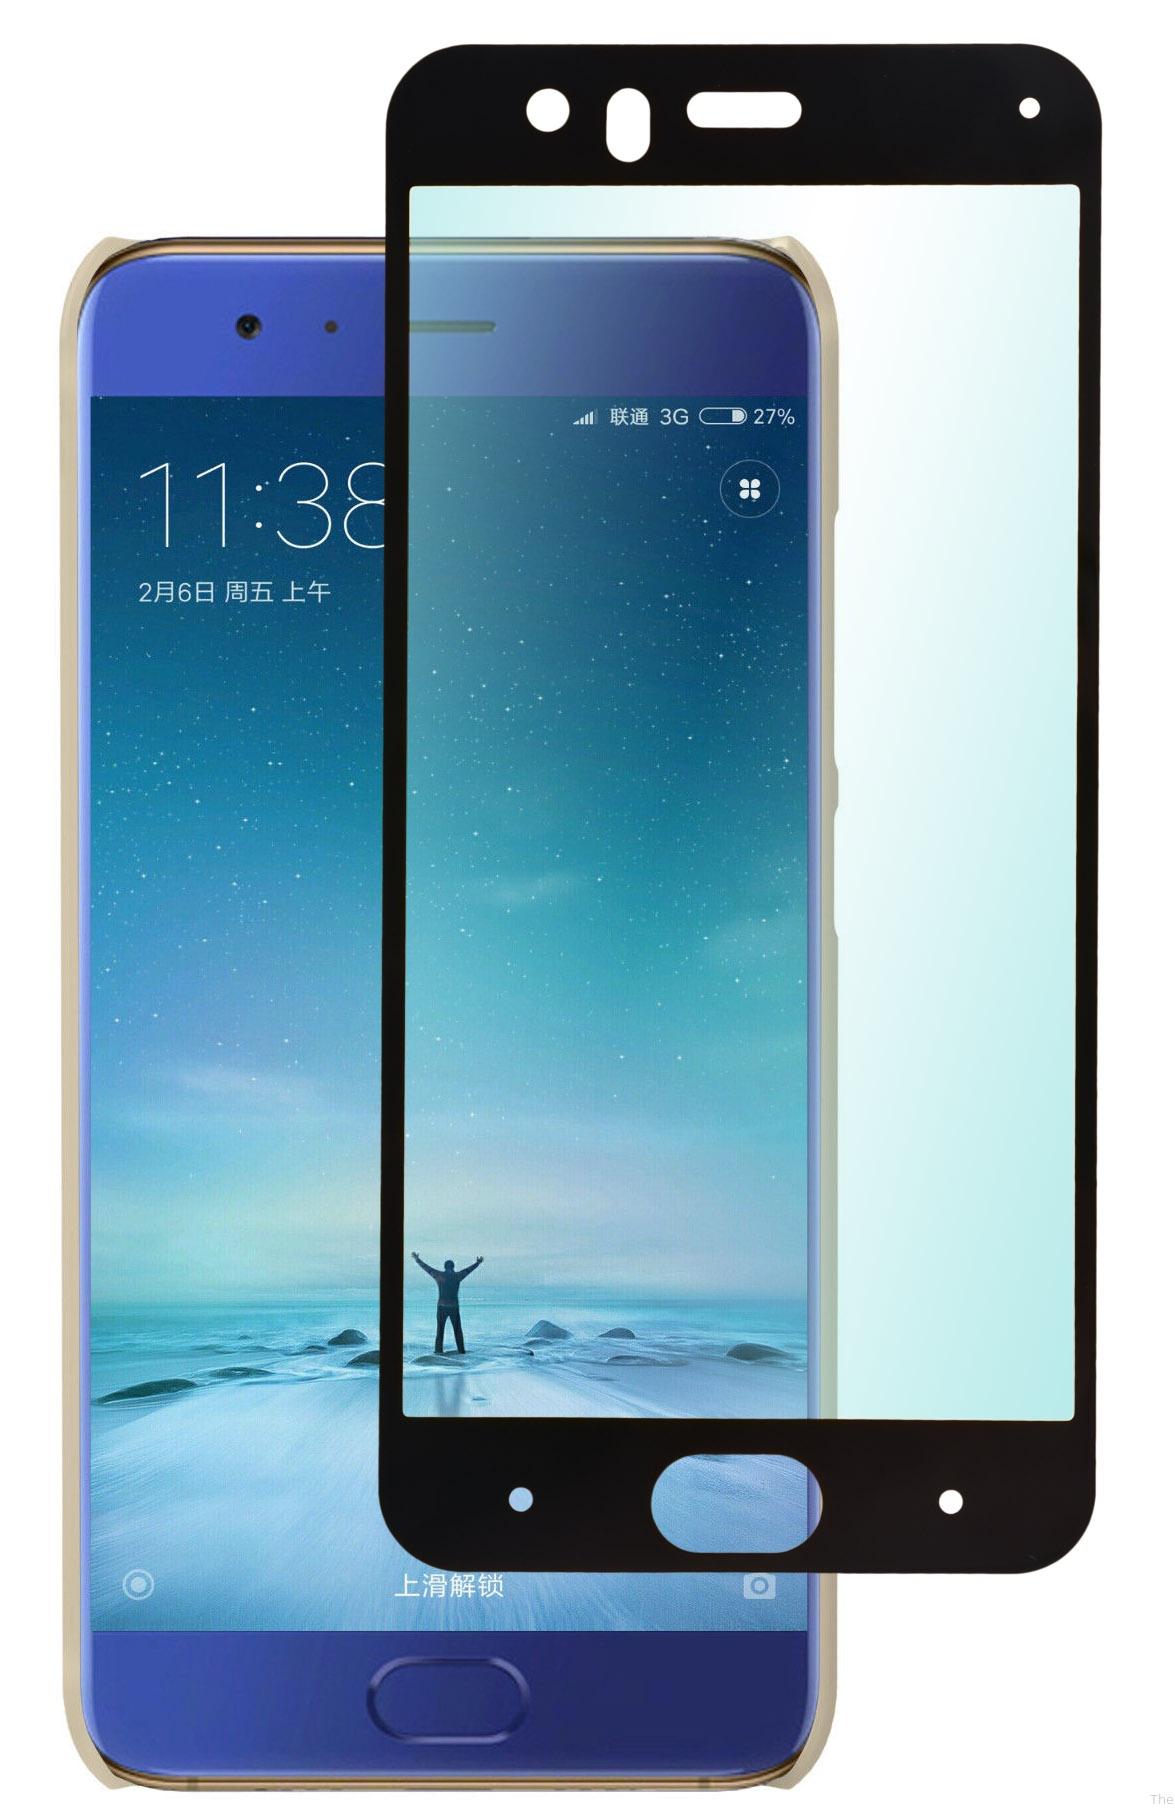 Защитное стекло skinBOX full screen, 4630042522763, черный защитное стекло skinbox full screen 4630042522817 черный